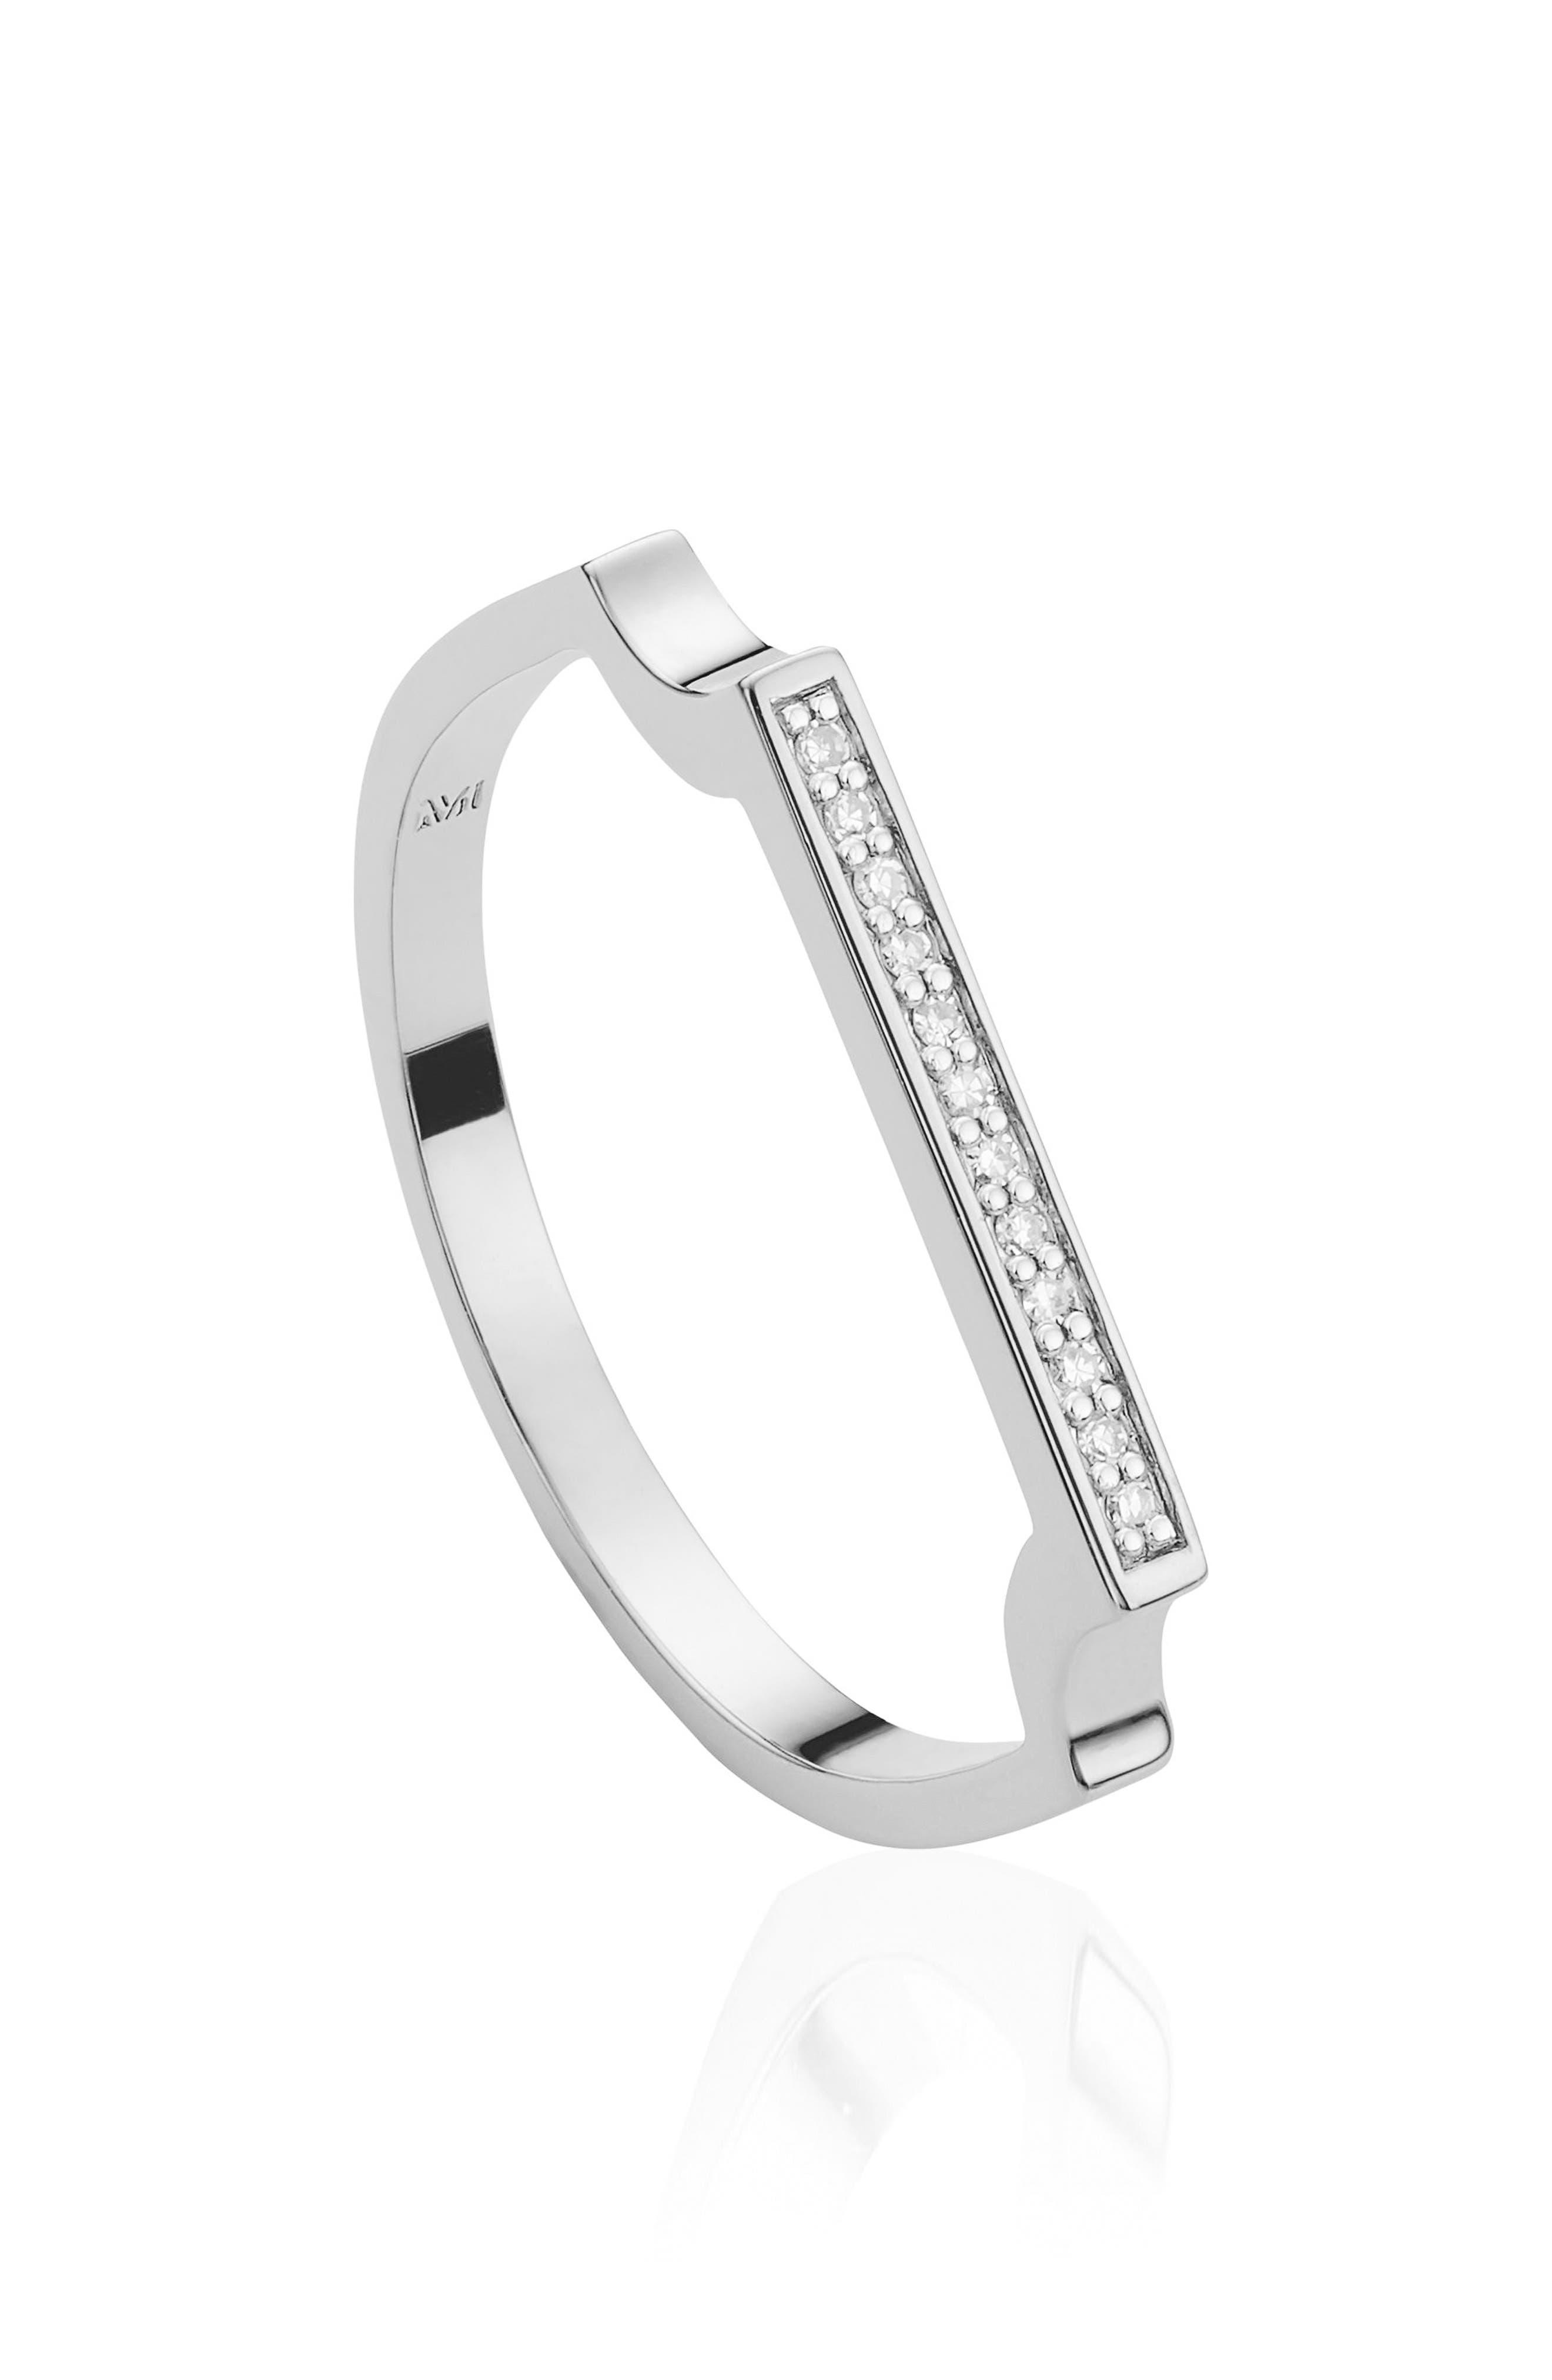 Signature Thin Diamond Ring,                             Alternate thumbnail 2, color,                             SILVER/ DIAMOND